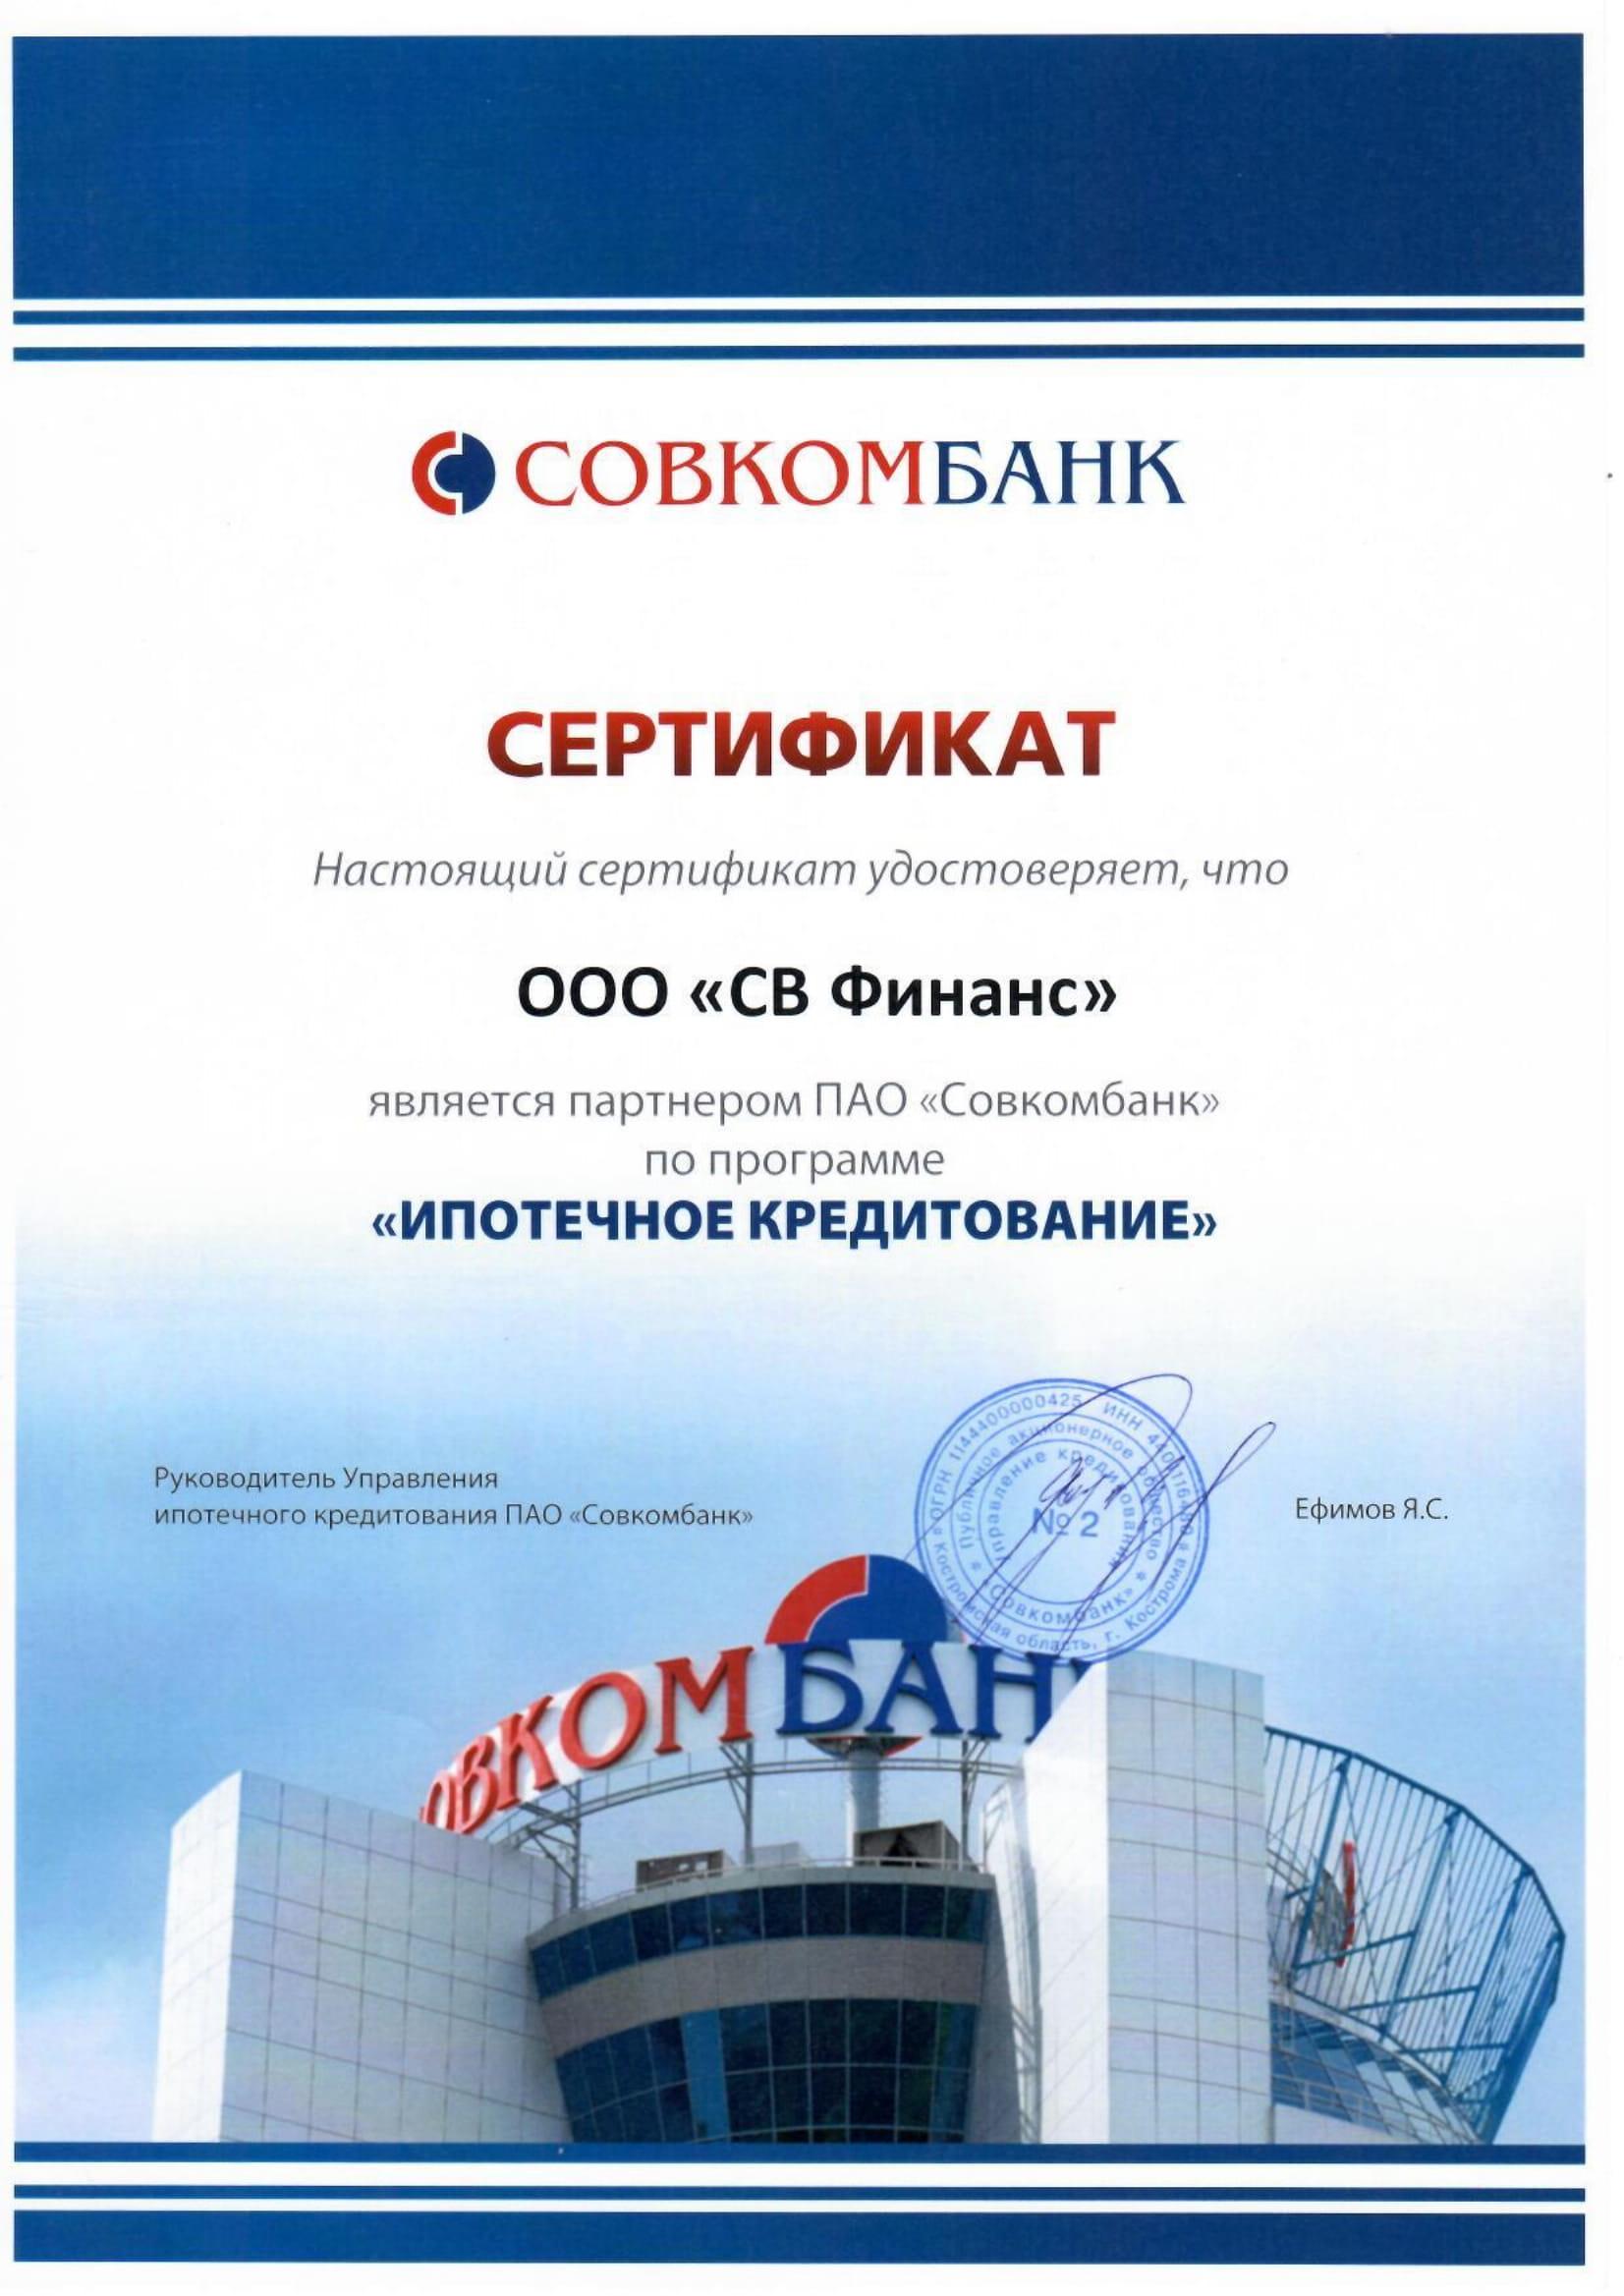 Совкомбанк сертификт-1